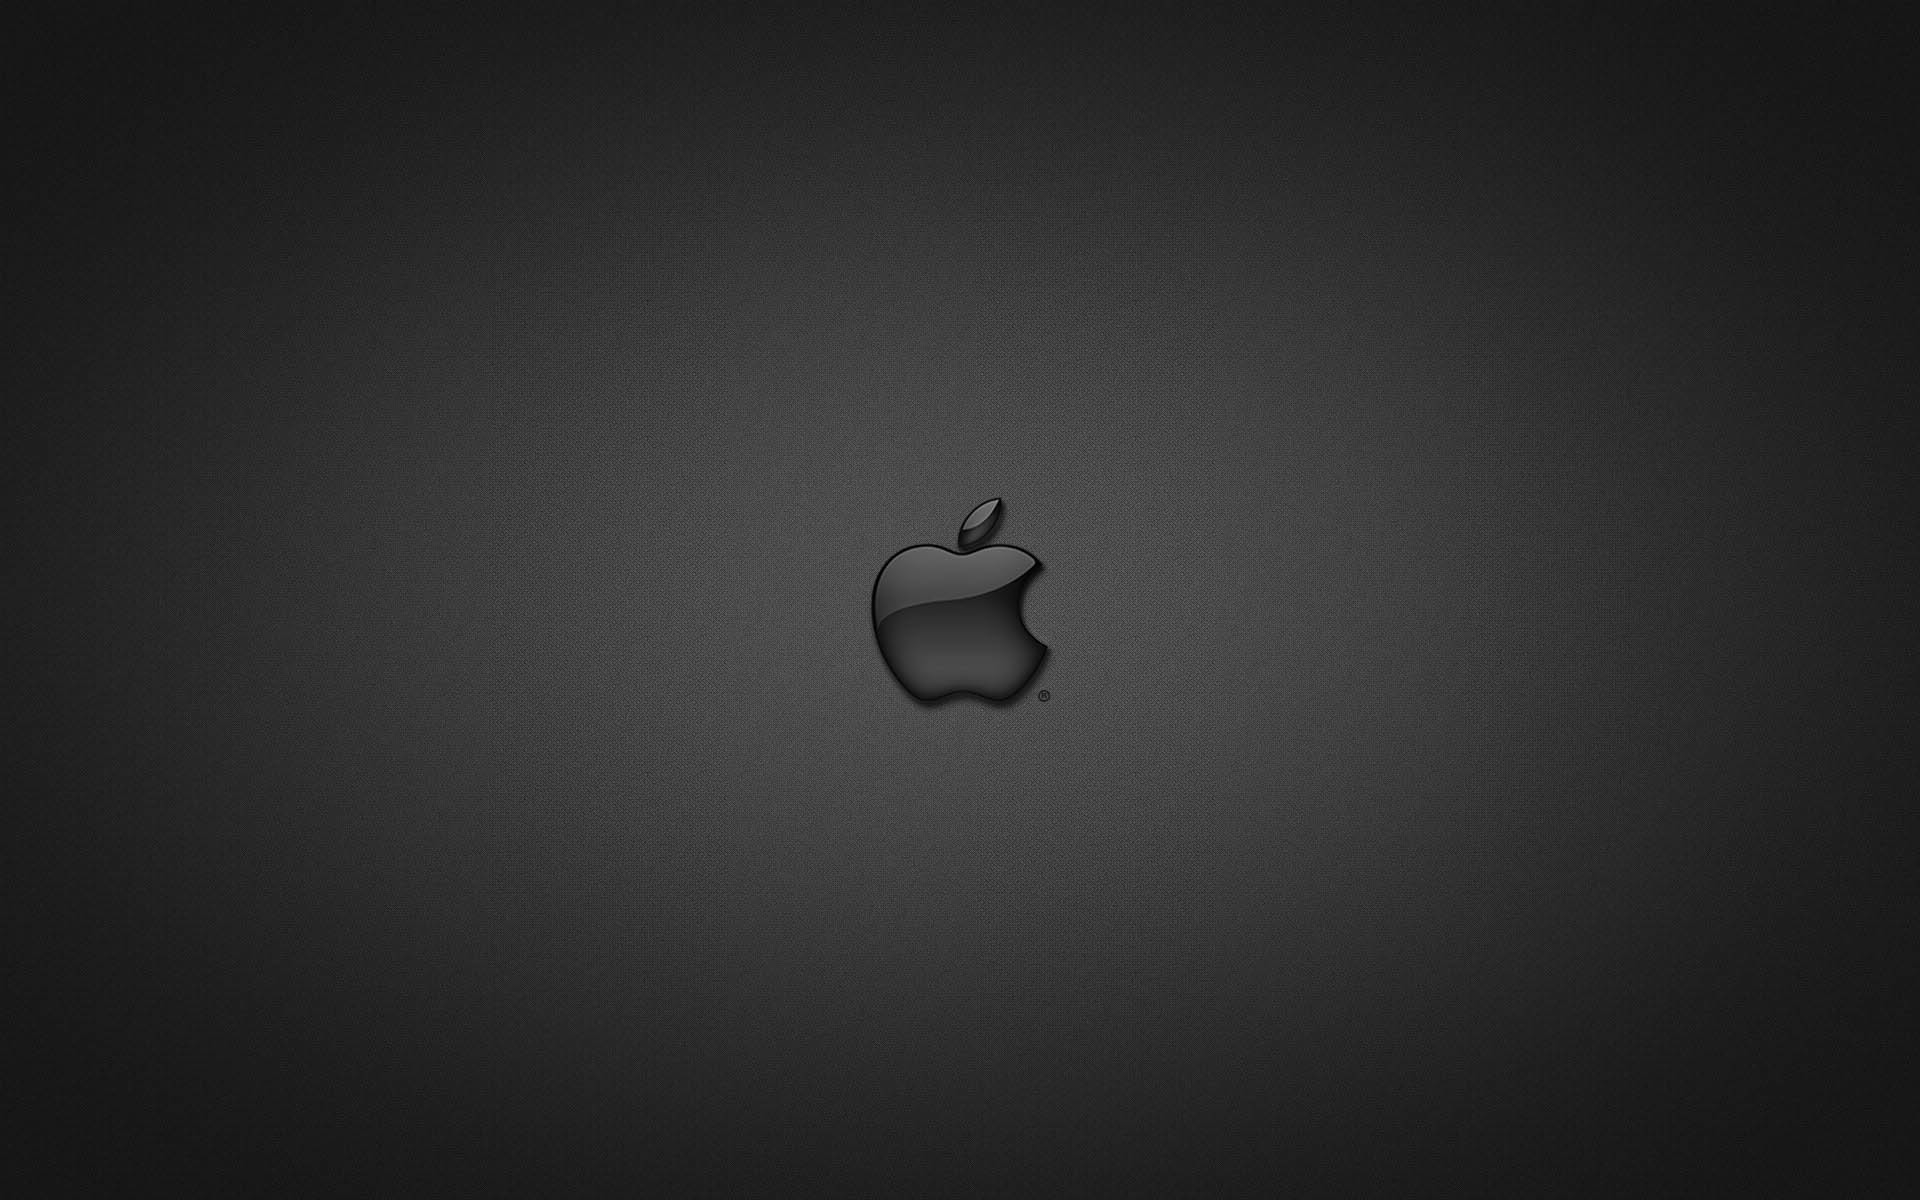 Wallpaper Black Apple